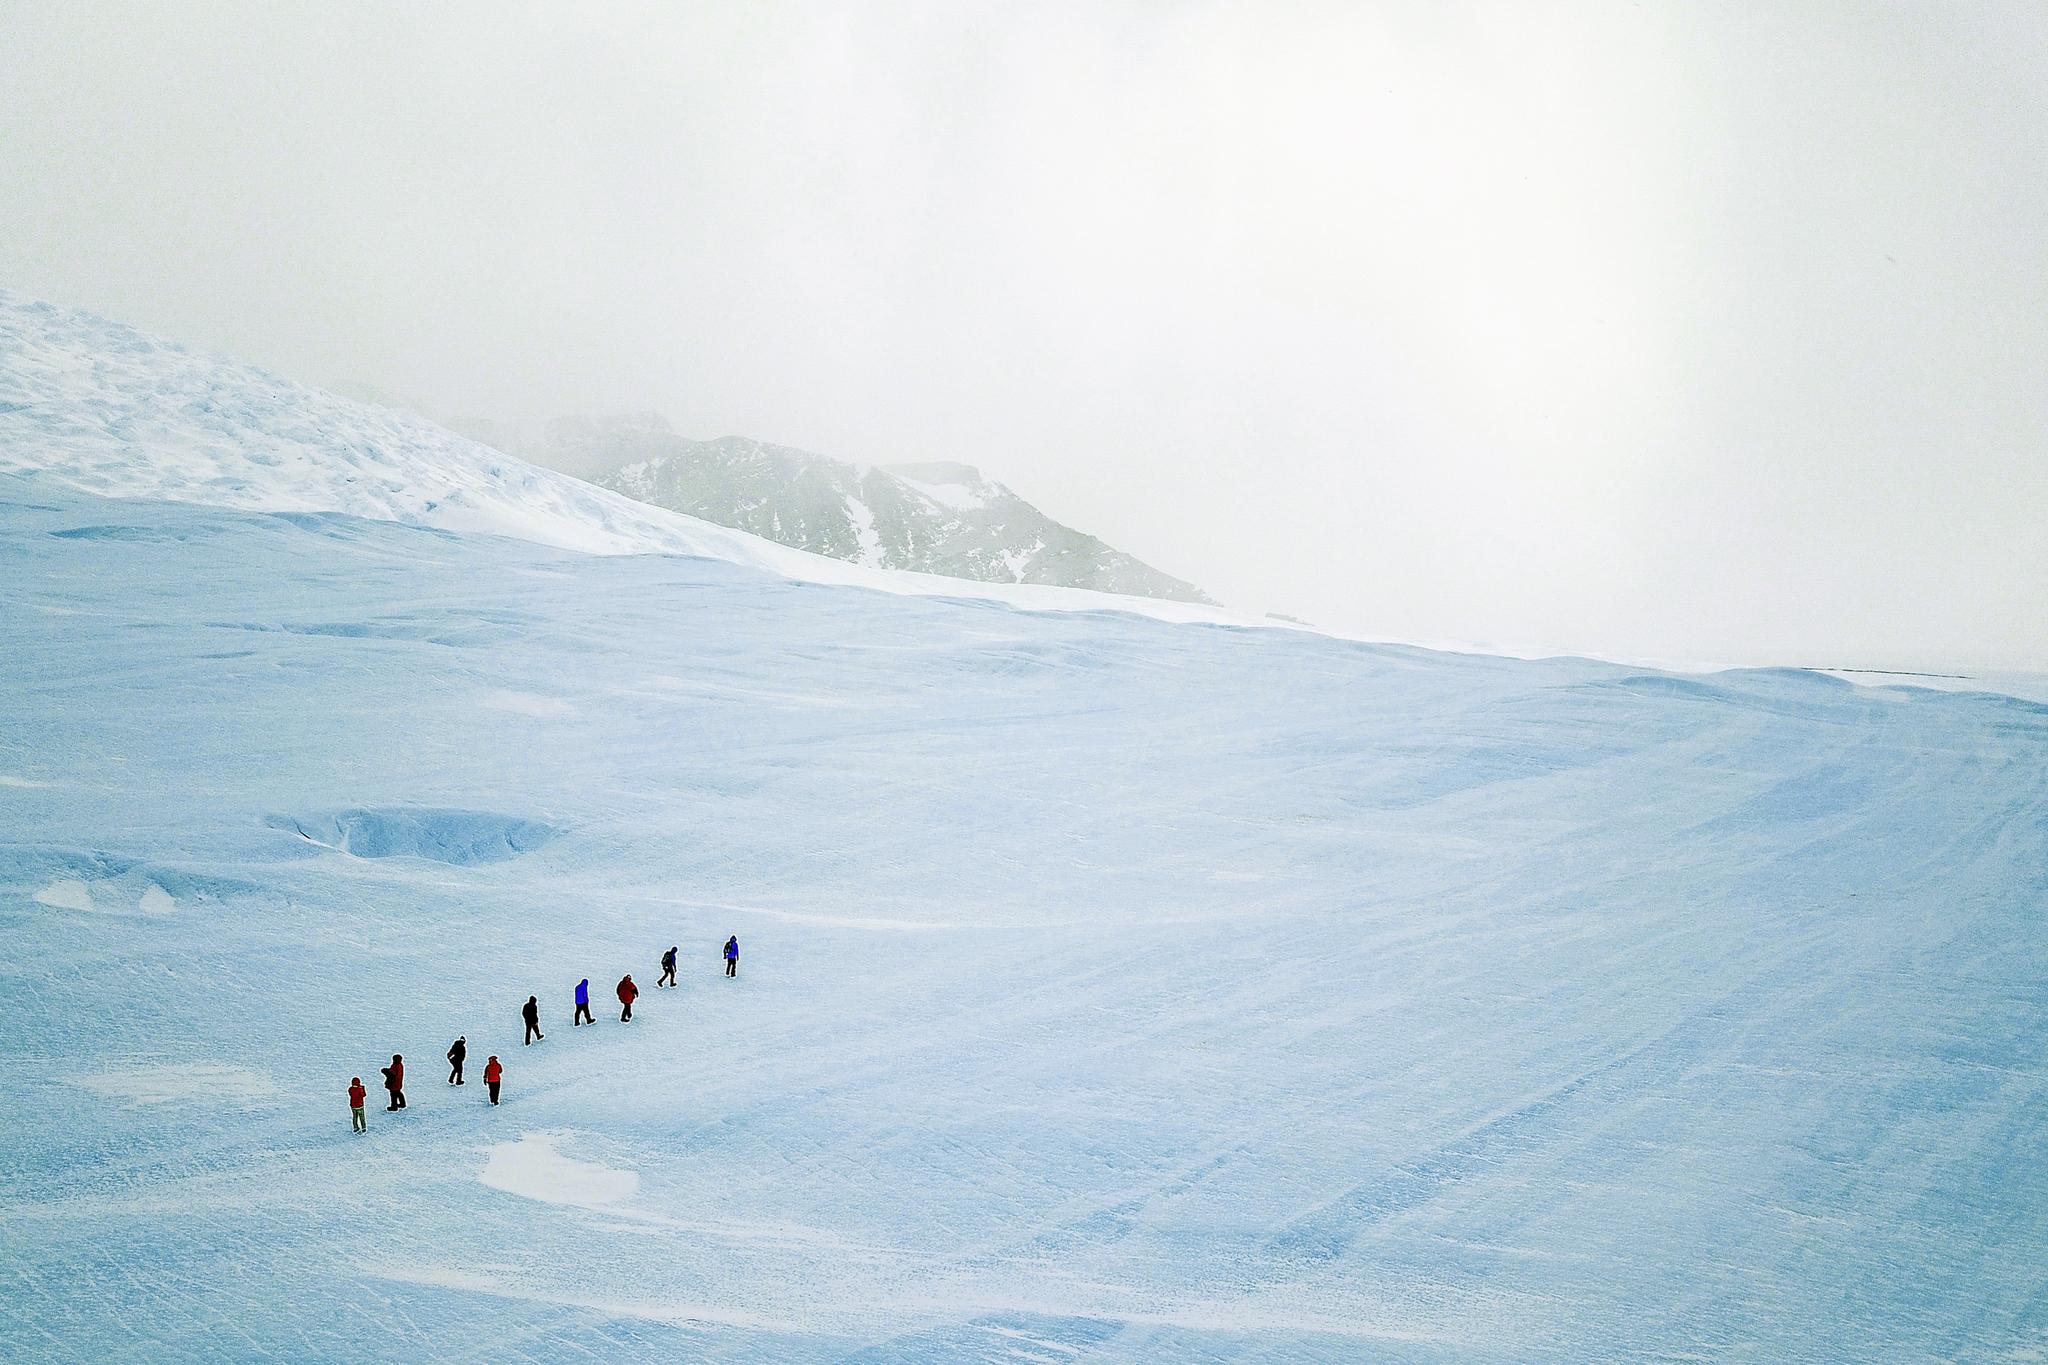 Airbnb viaggio in Antartide - Neomag.